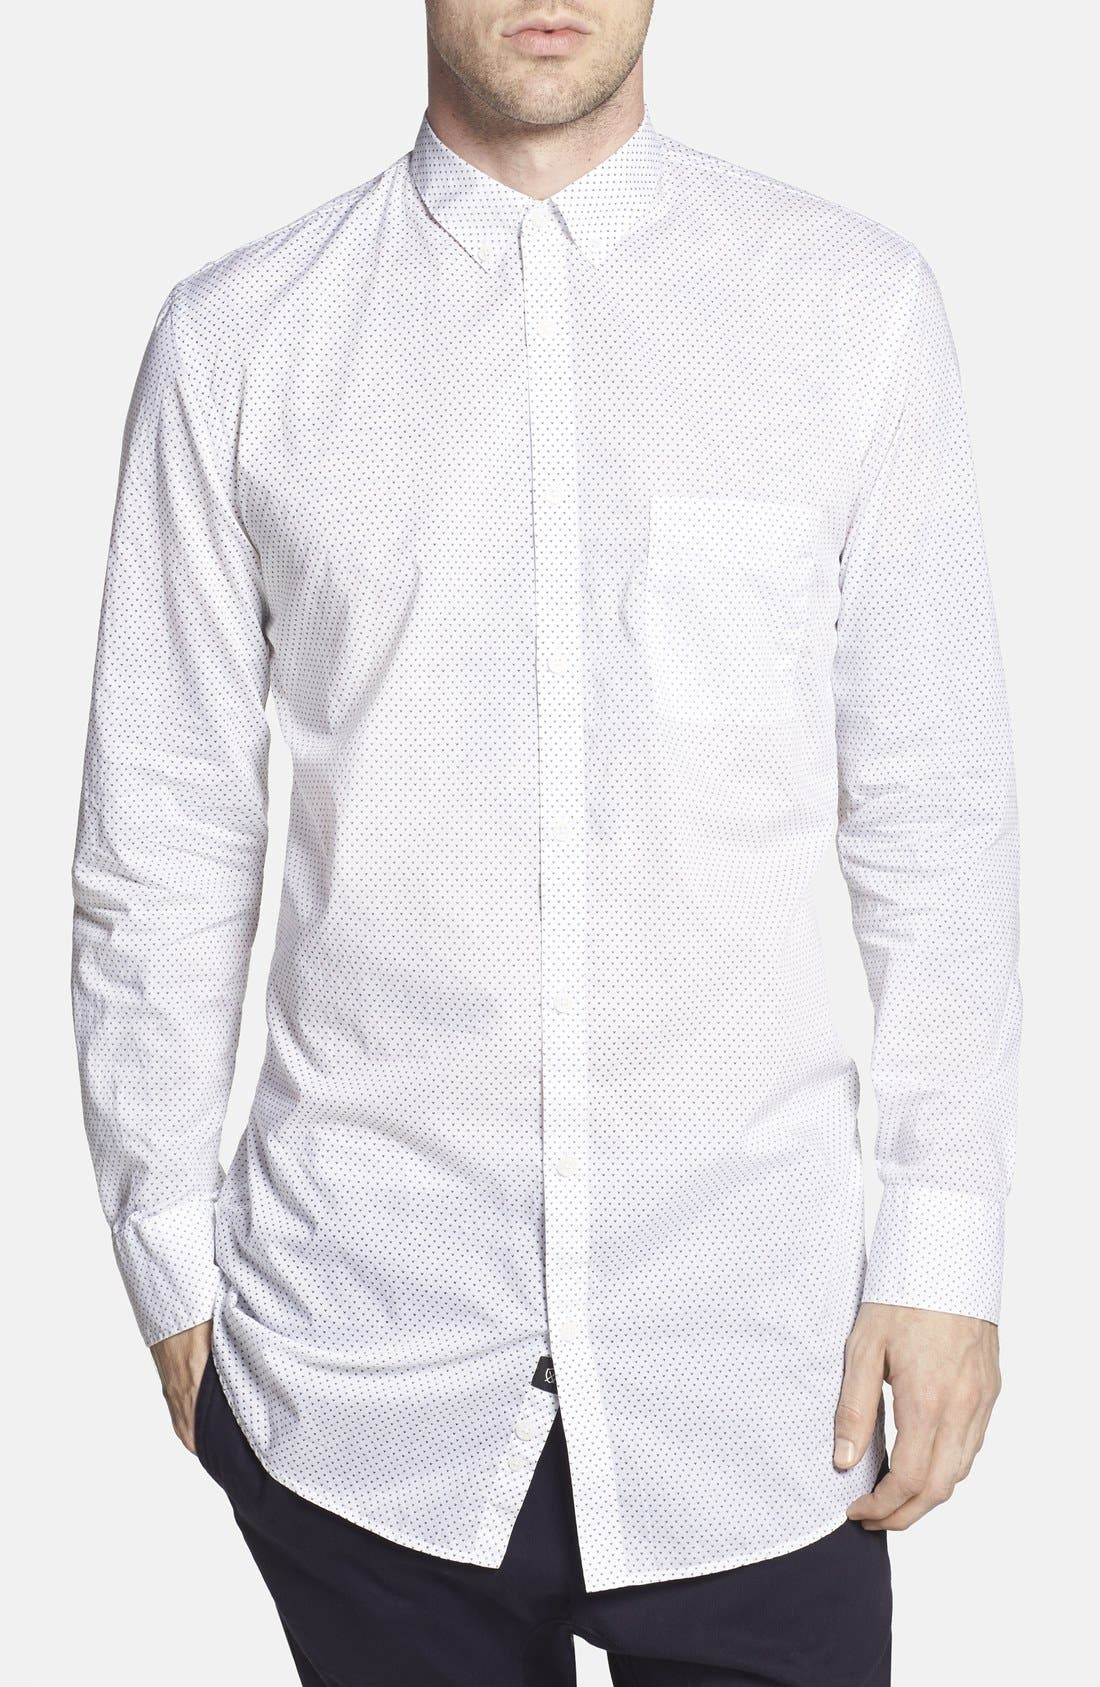 'Eight Foot' Elongated Print Woven Shirt, Main, color, 100